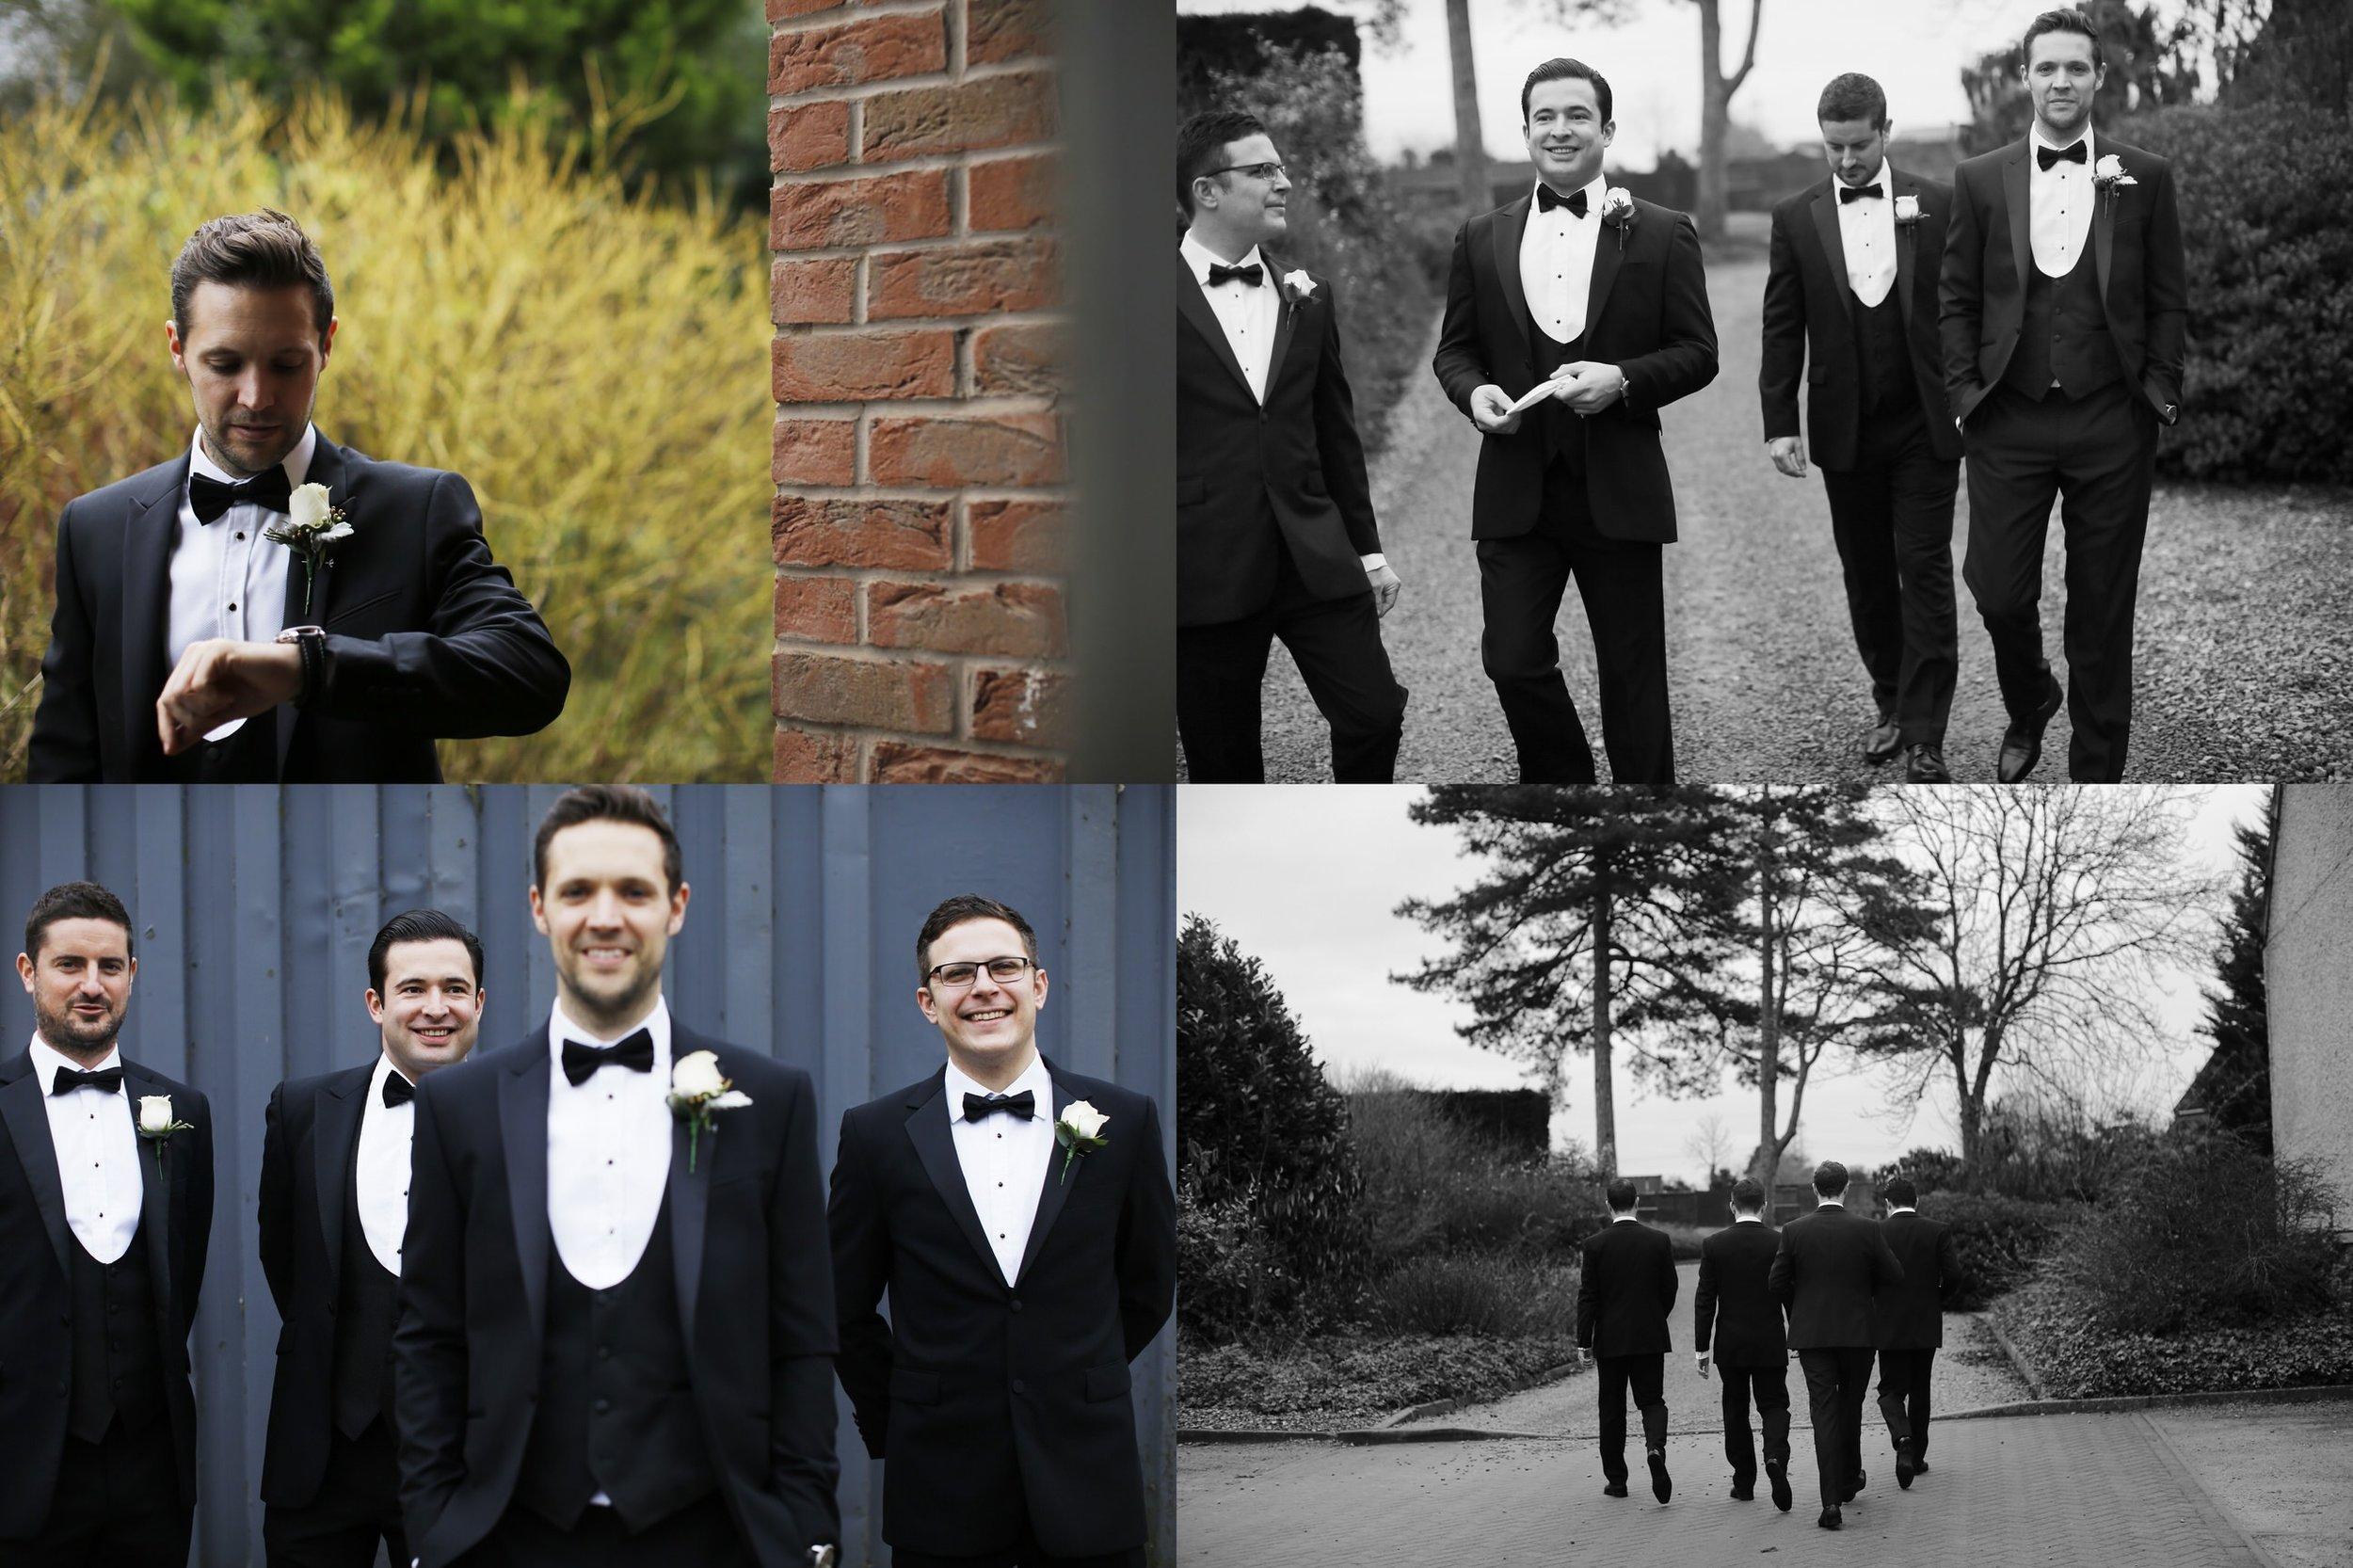 brett-harkness-winter-wedding-uk-wedding-photographer_0006.jpg